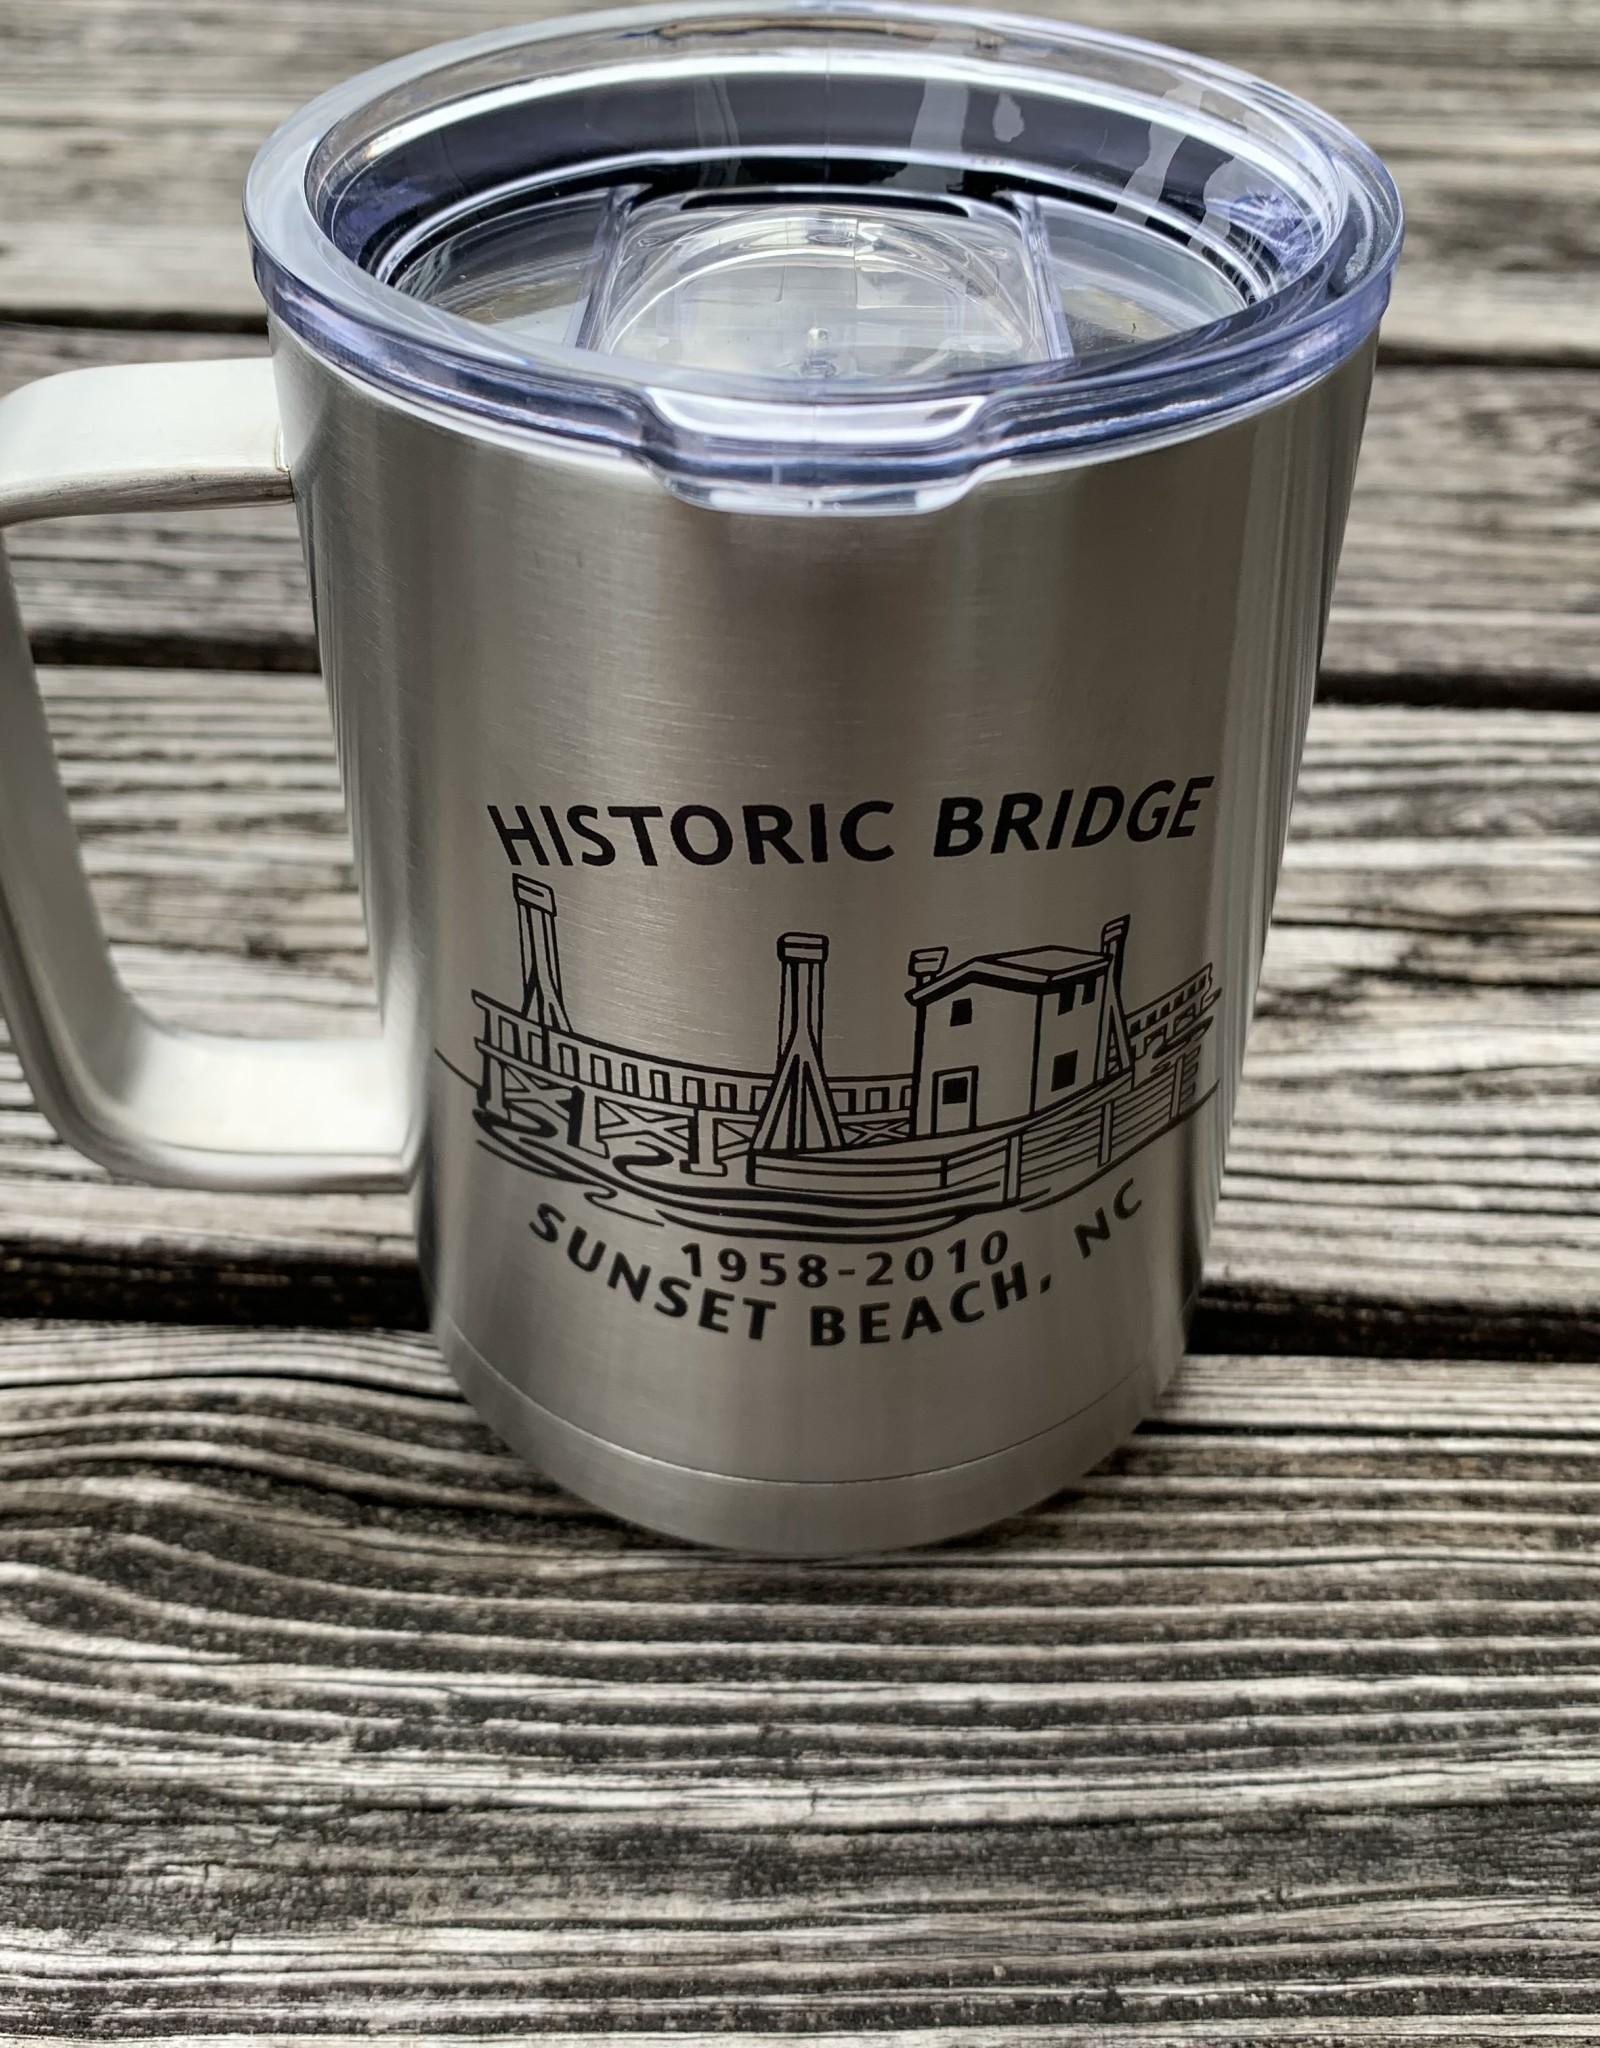 HISTORIC BRIDGE INSULATED MUG STAINLESS STEEL